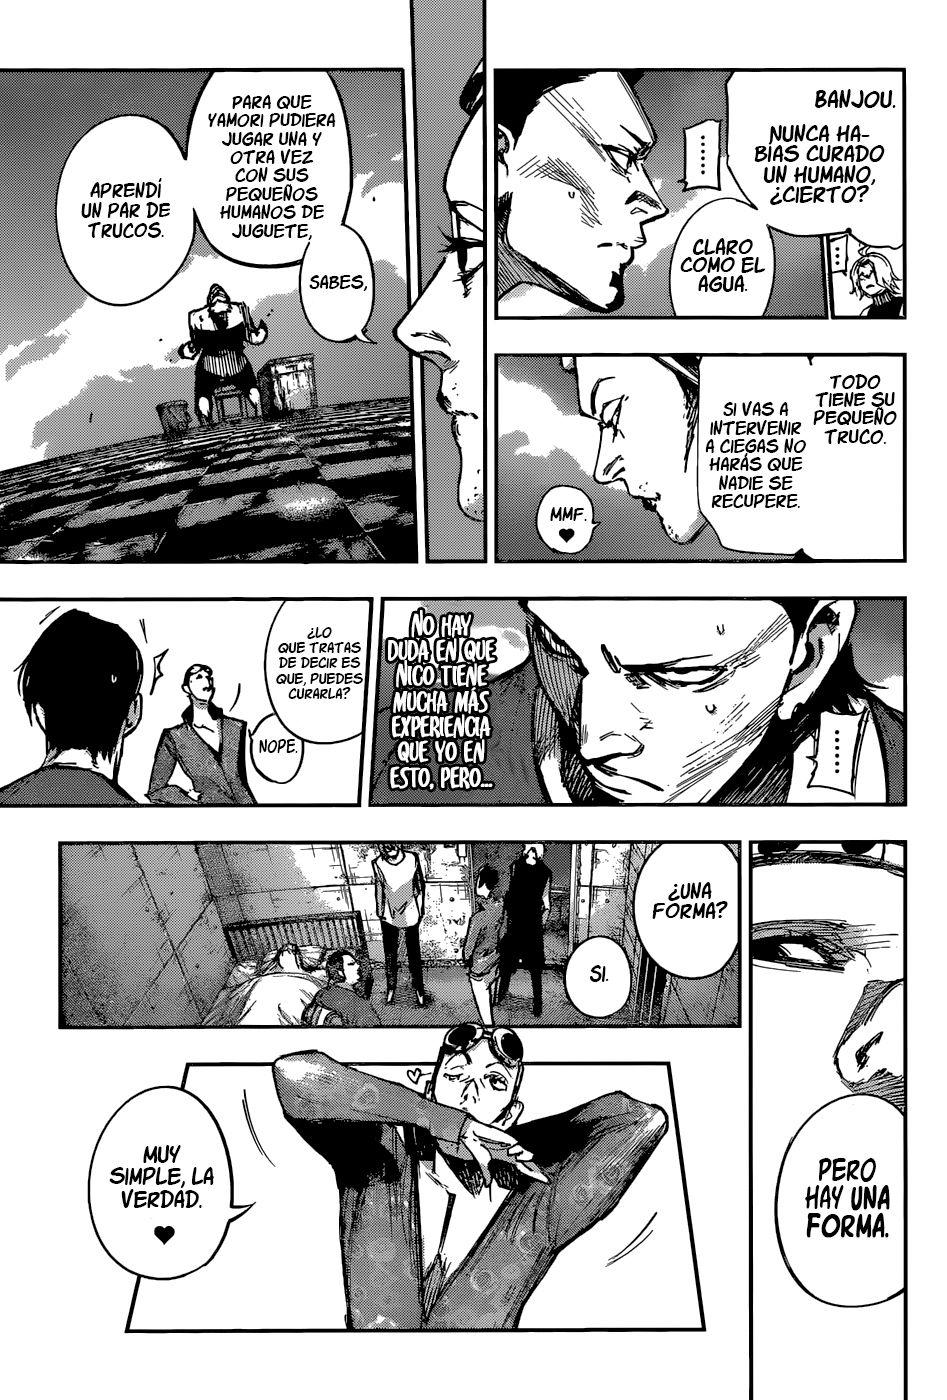 http://c5.ninemanga.com/es_manga/pic2/59/59/518457/22e5bd72848fd6a2d1516a0cf00e6933.jpg Page 4